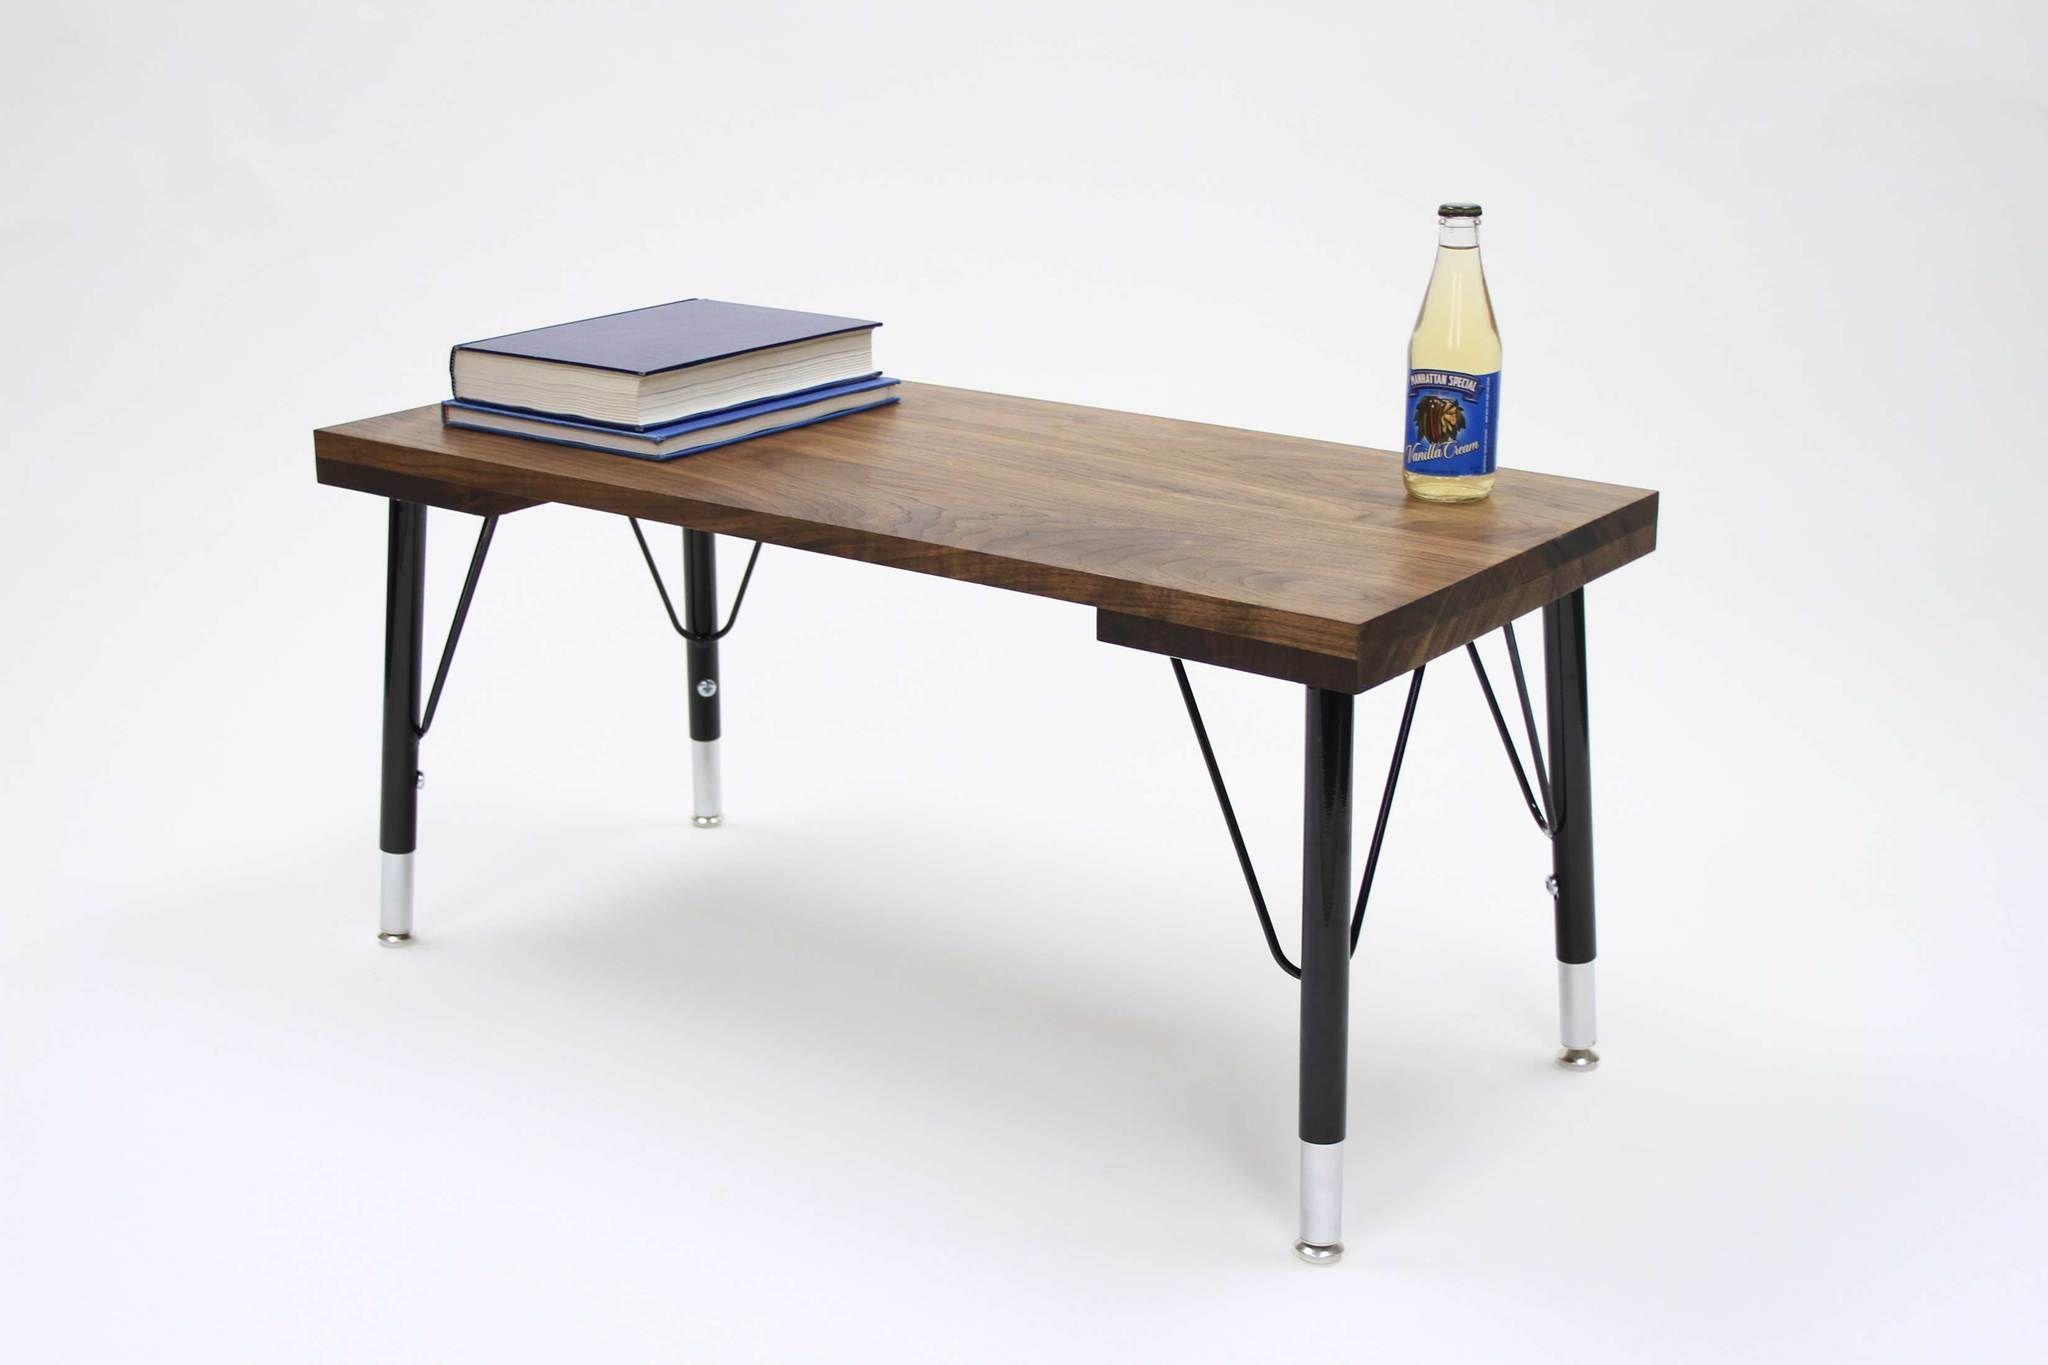 Industrial Table Leg Set Industrial Table Legs Industrial Interiors Industrial Table